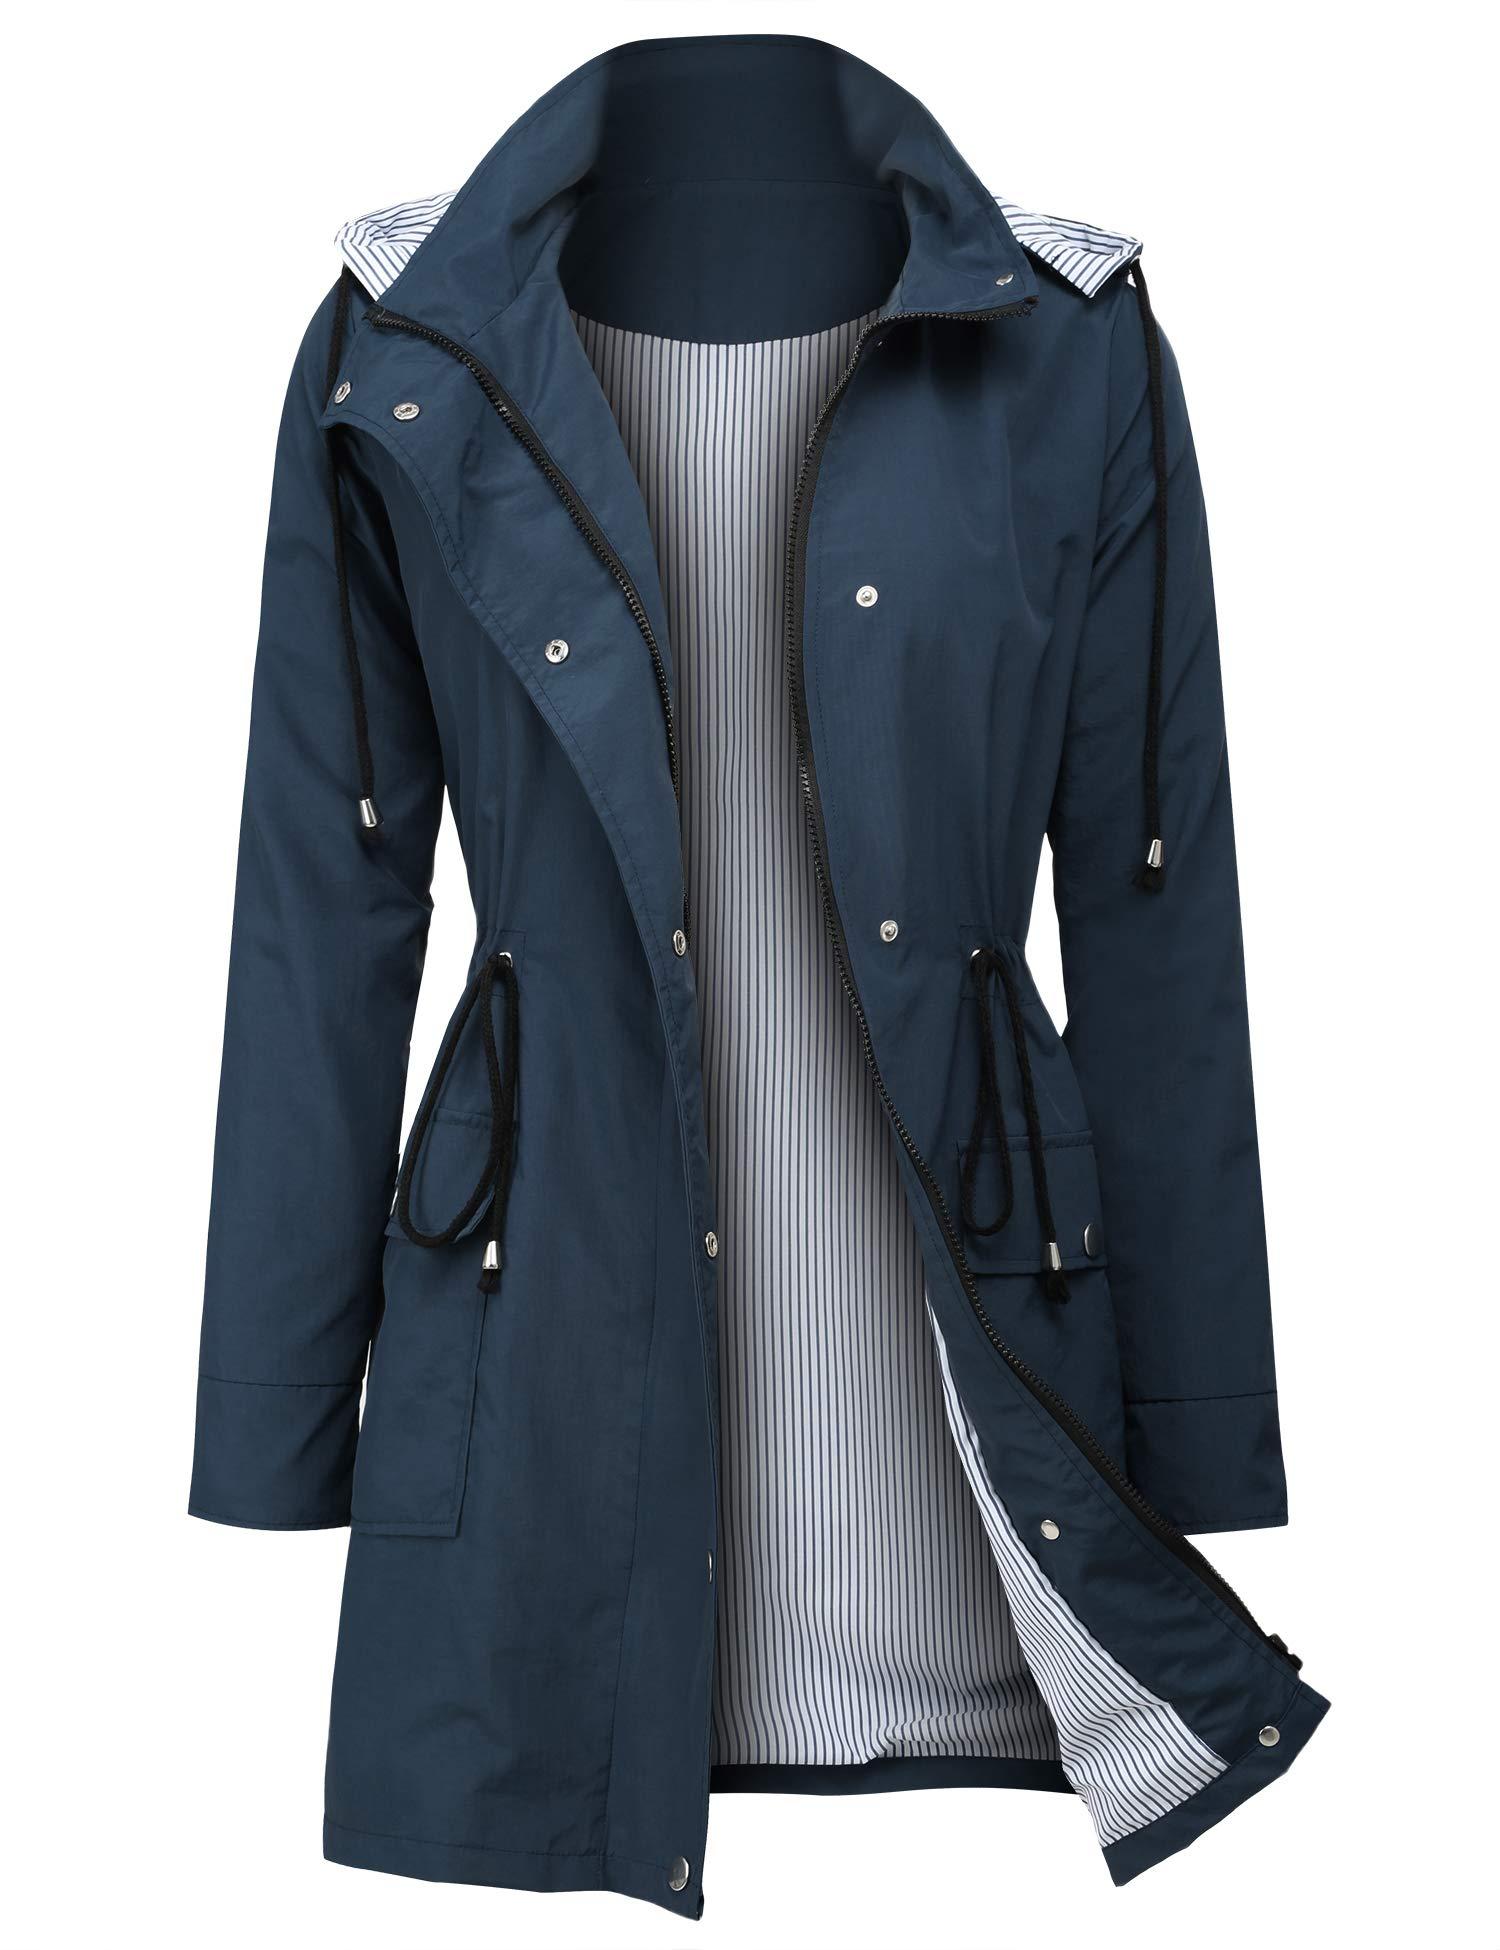 ZEGOLO Women's Rain Jacket Waterproof Hooded Lightweight Active Outdoor Raincoats by ZEGOLO